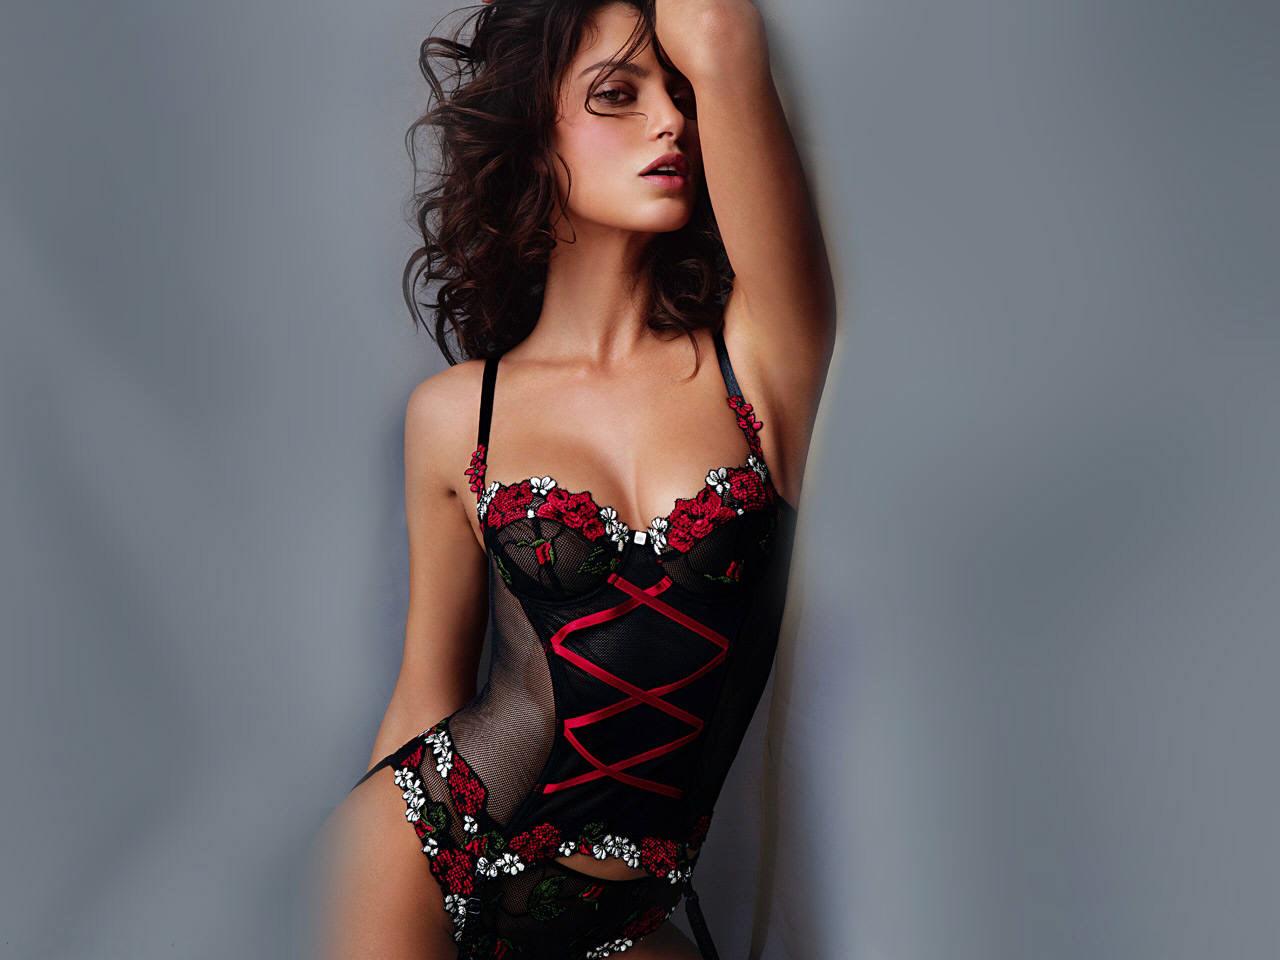 from Kristopher pakistani model nude photos hd